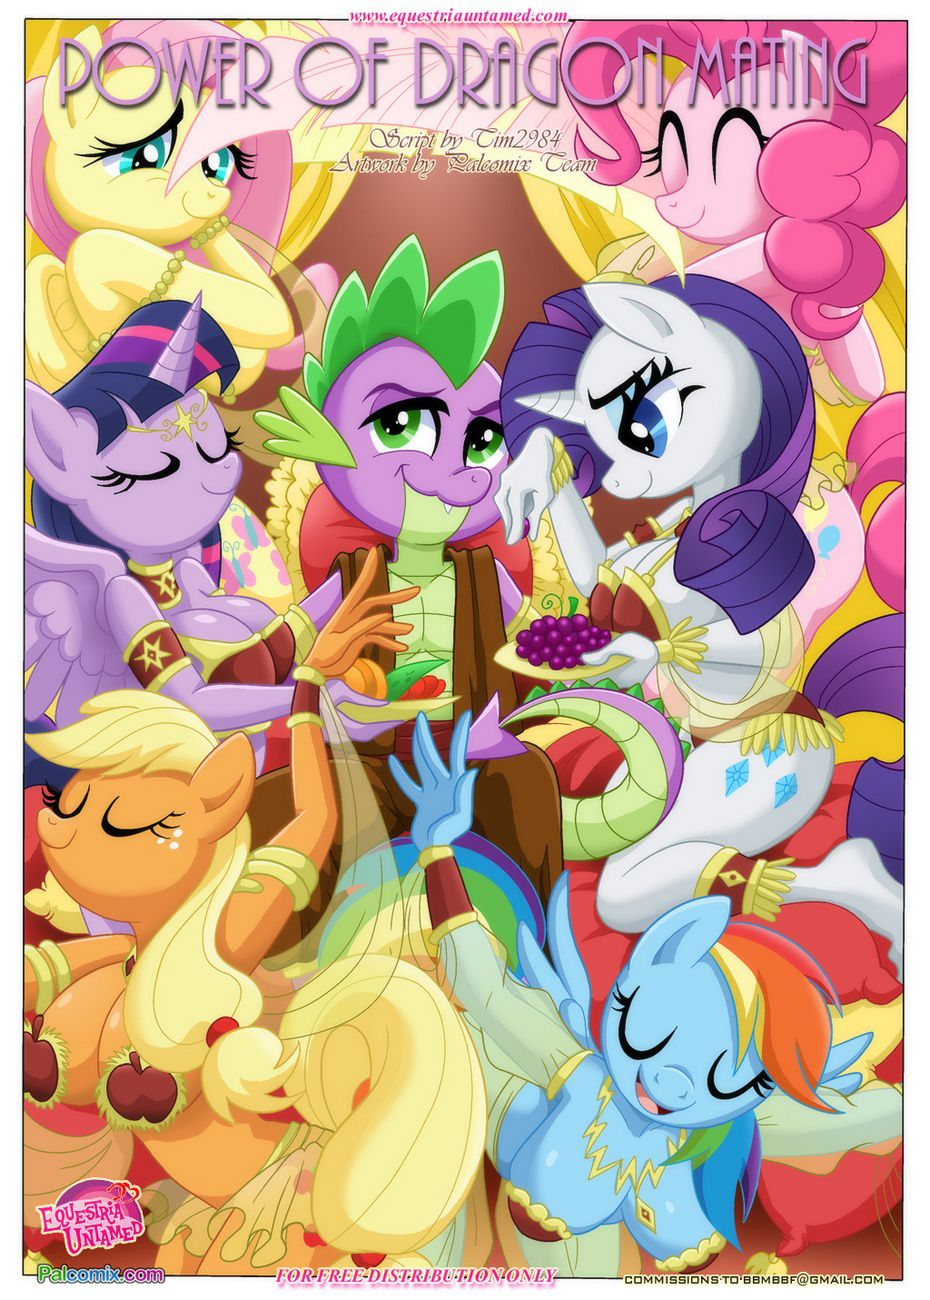 My liten ponny comic porno en español Spike S Harem My Little Pony Friendship Is Magic Palcomix Free Hentai Manga Adult Webtoon Doujinshi Manga And Mature Comics